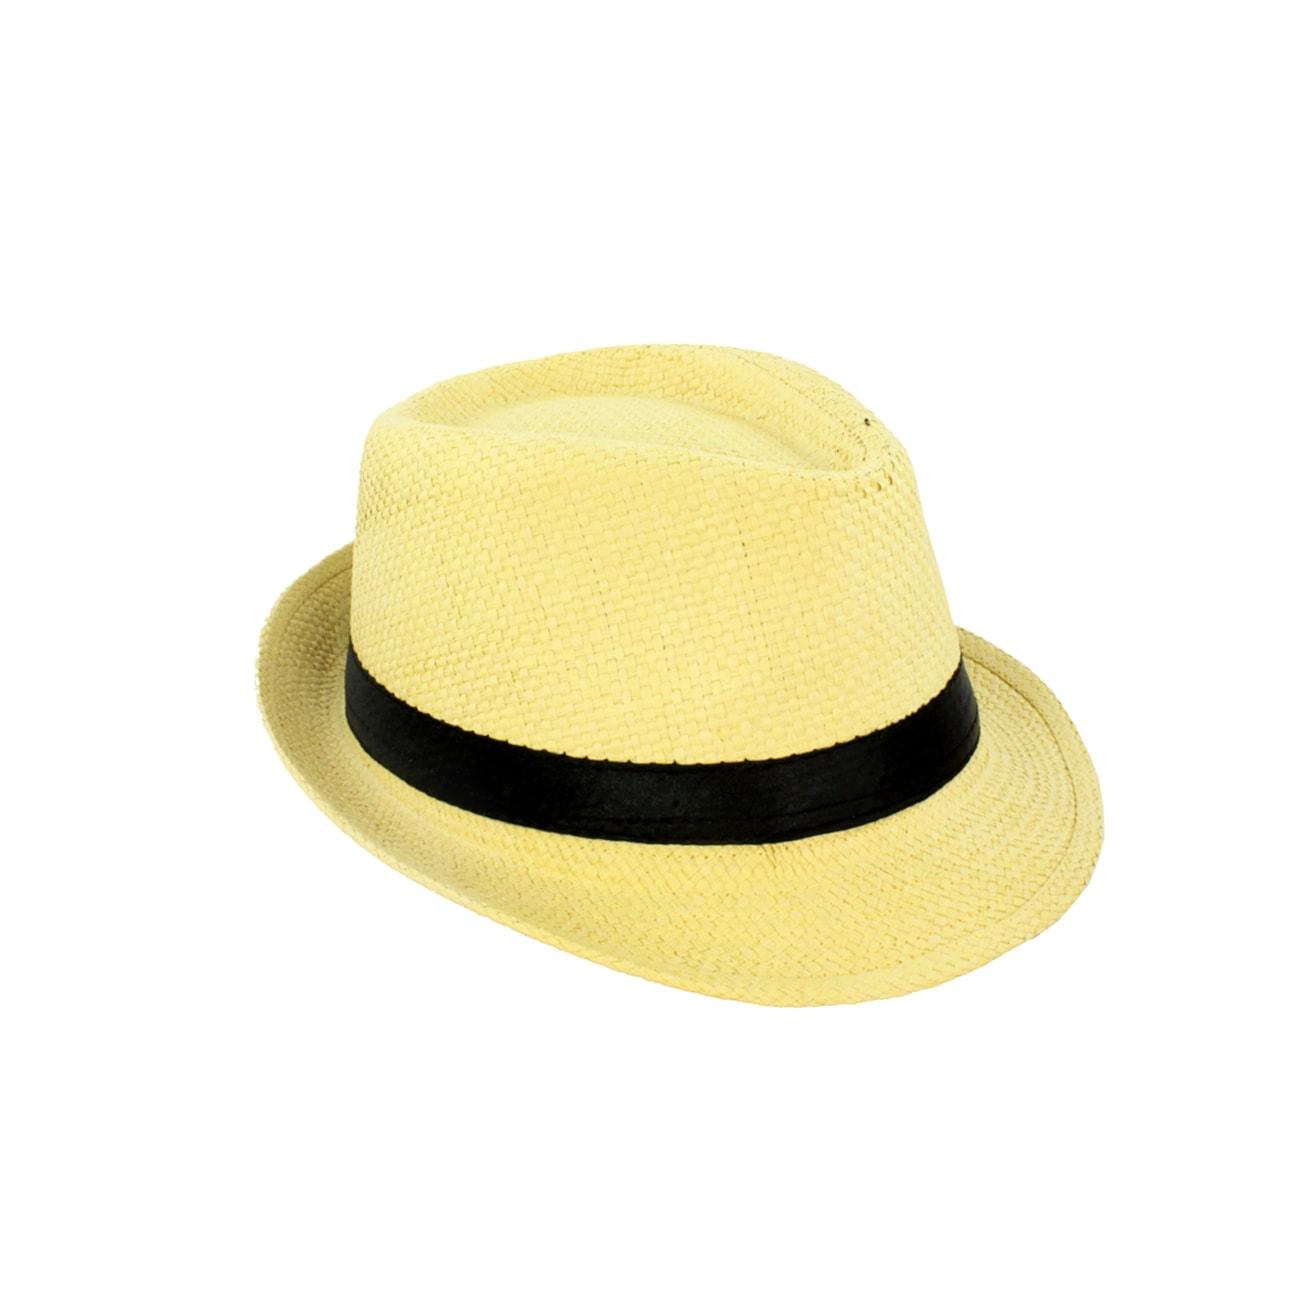 Faddism Unisex Raffia Straw Fedora Hat